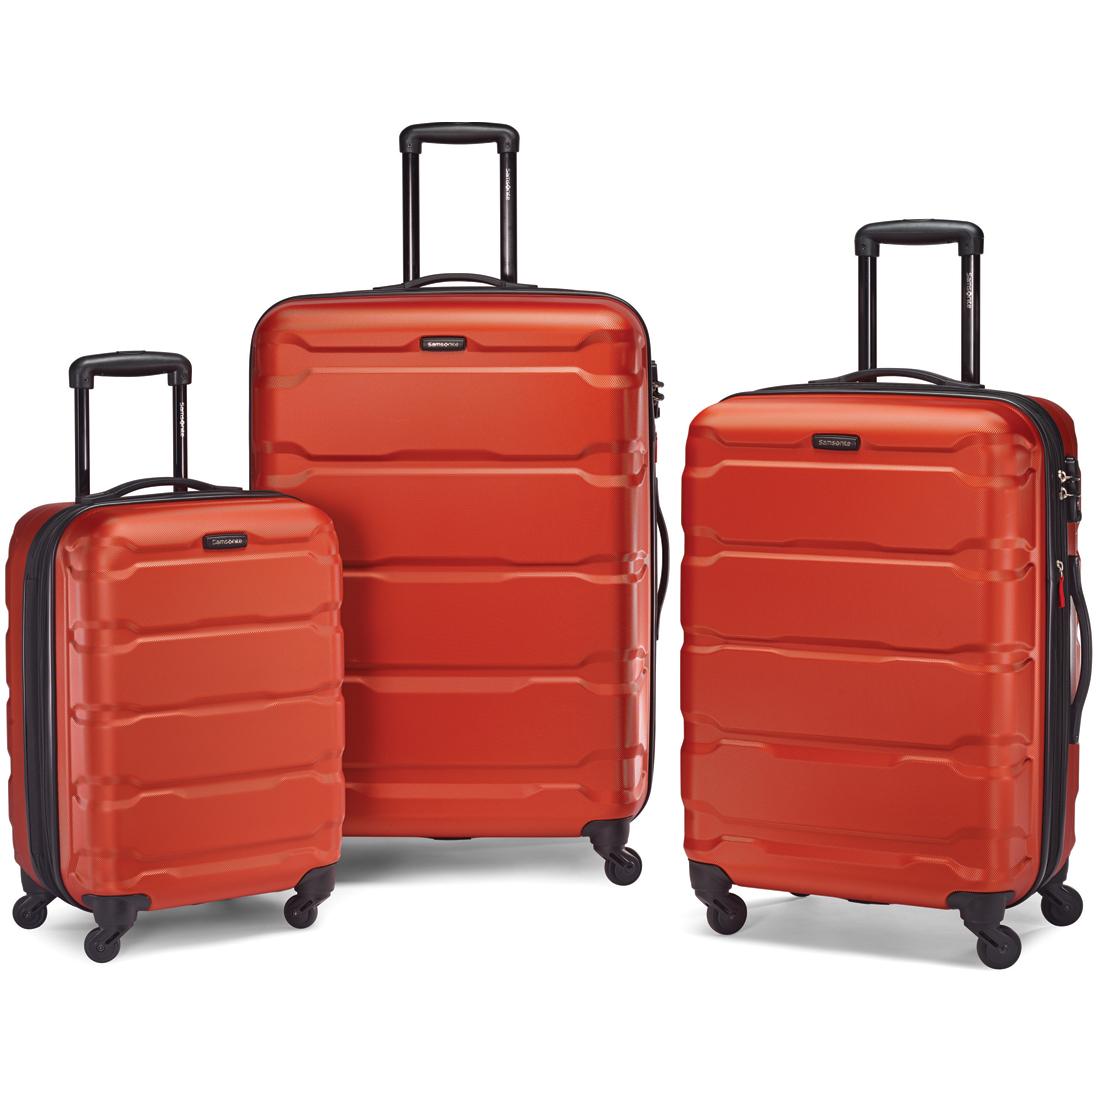 d44ef3e90 Samsonite Omni Hardside Luggage Set NEST (SP20/24/28)(Burnt Orange